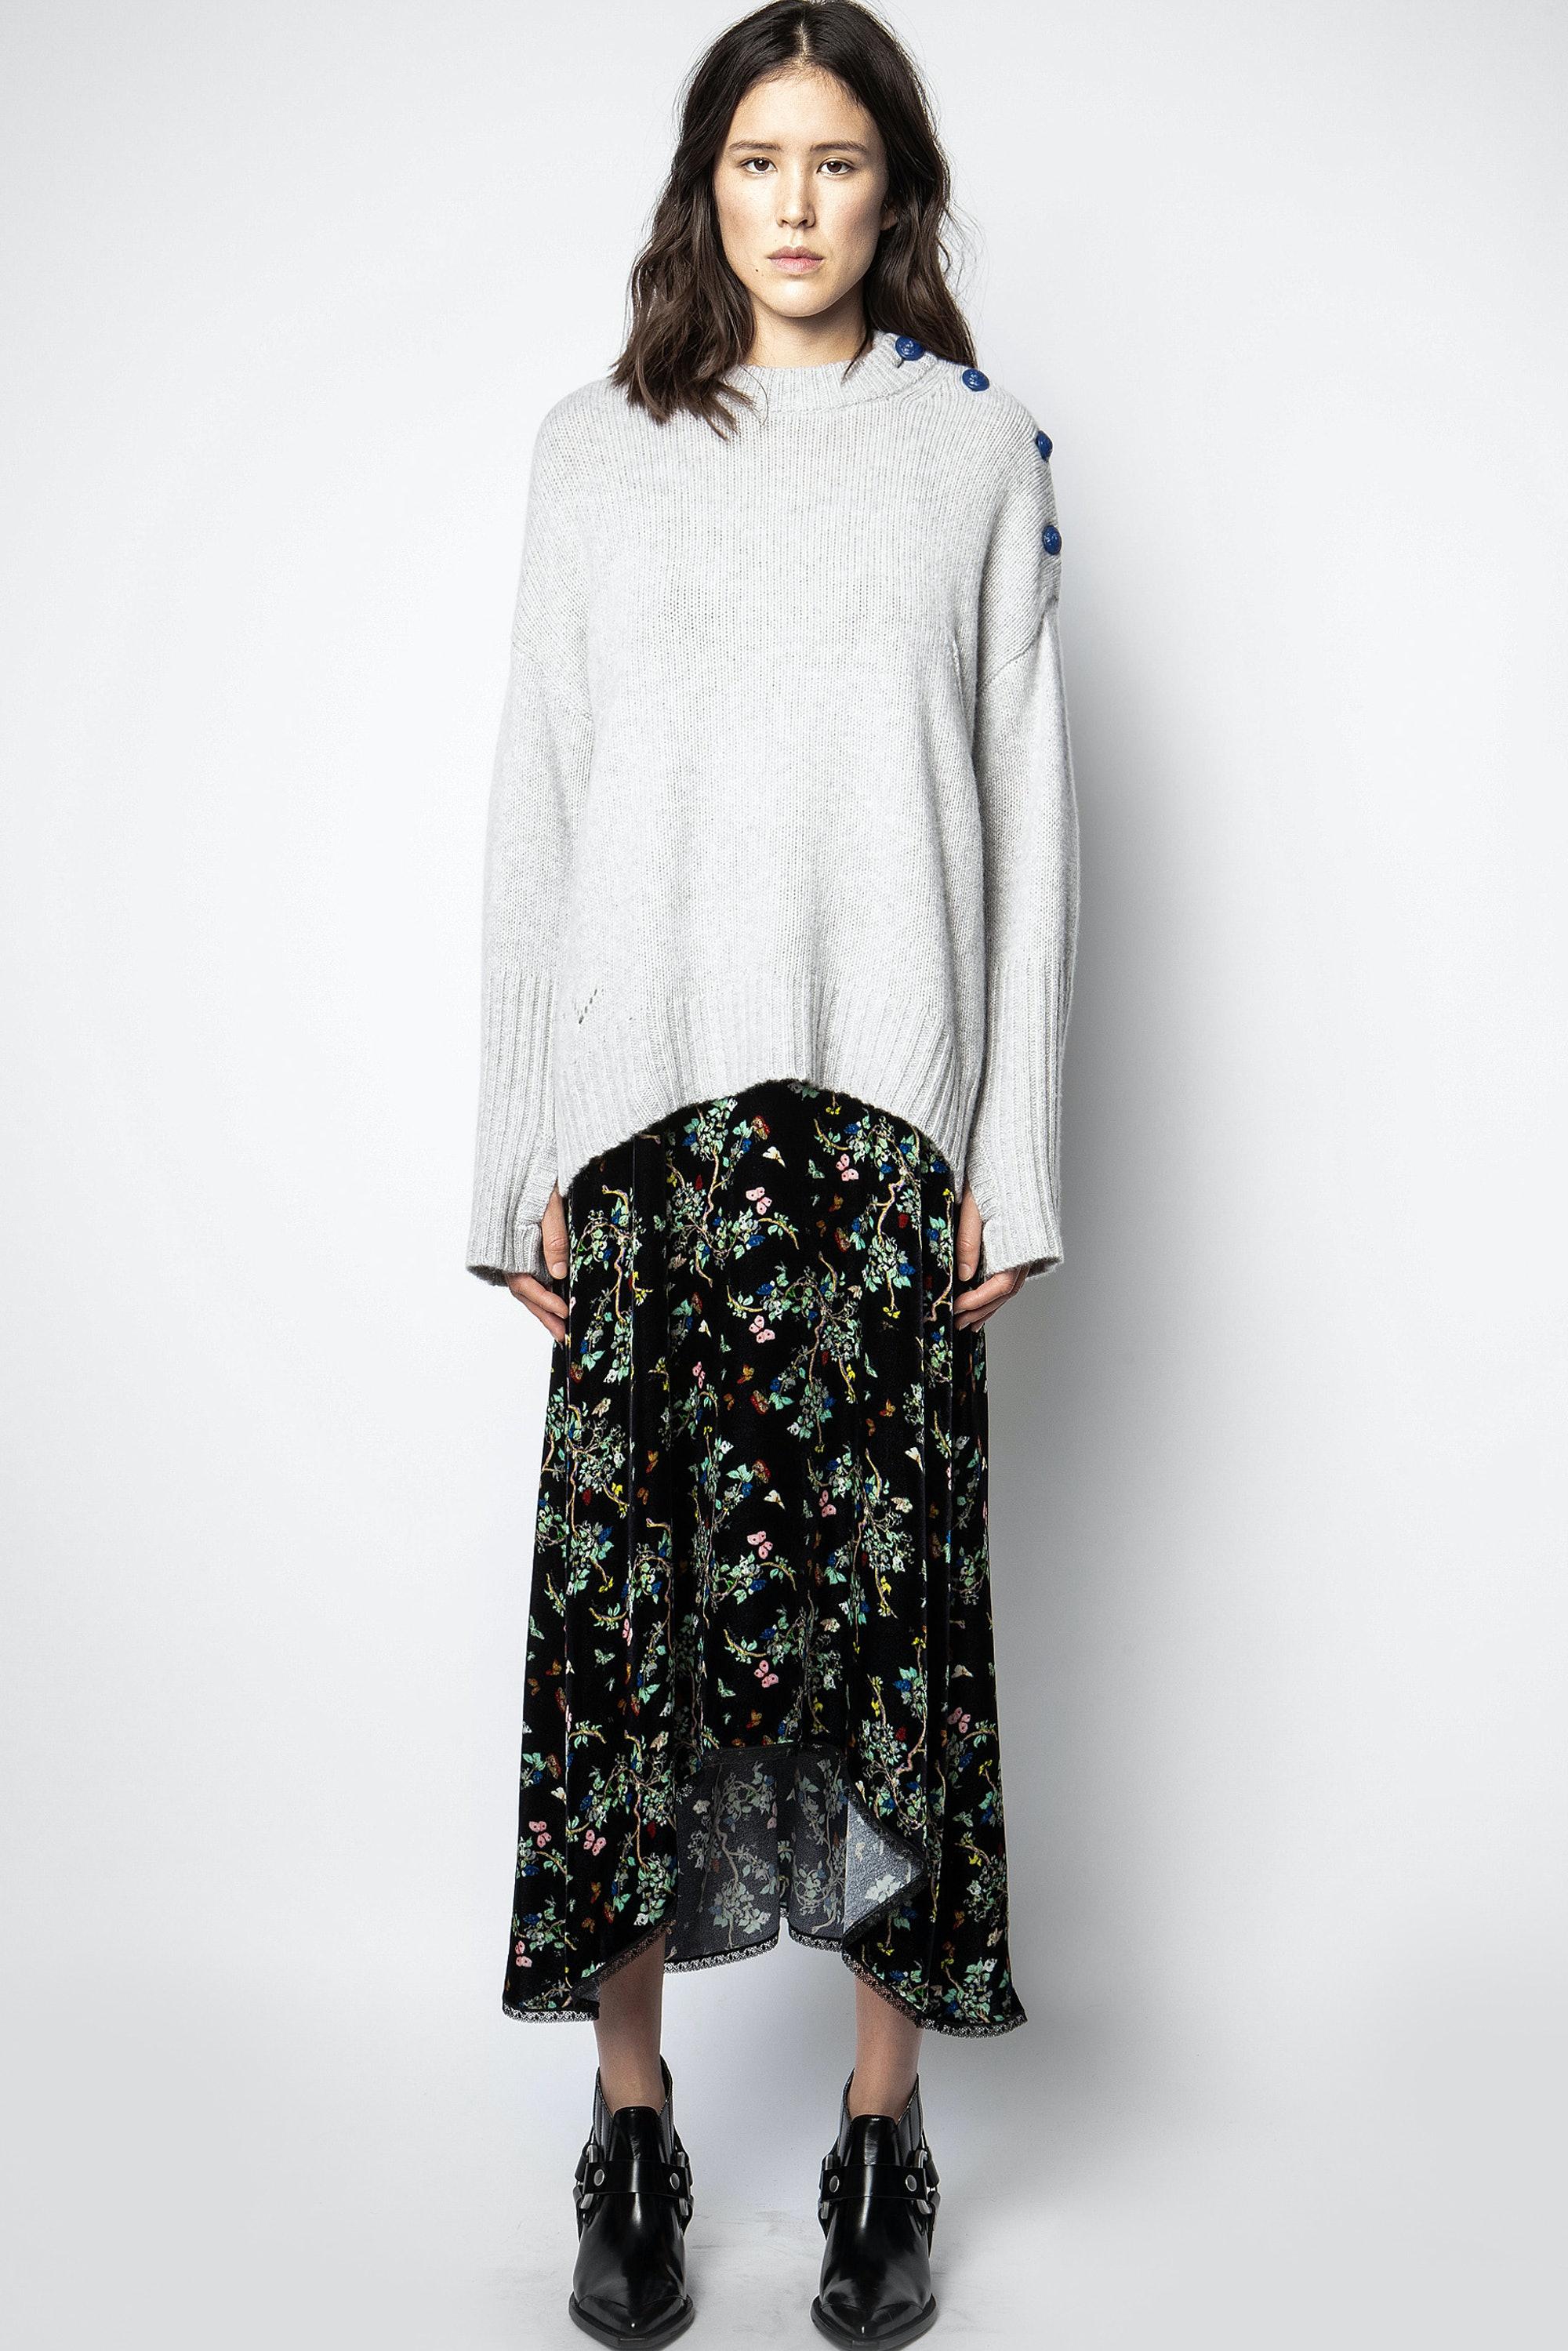 Malta Cachemire Sweater